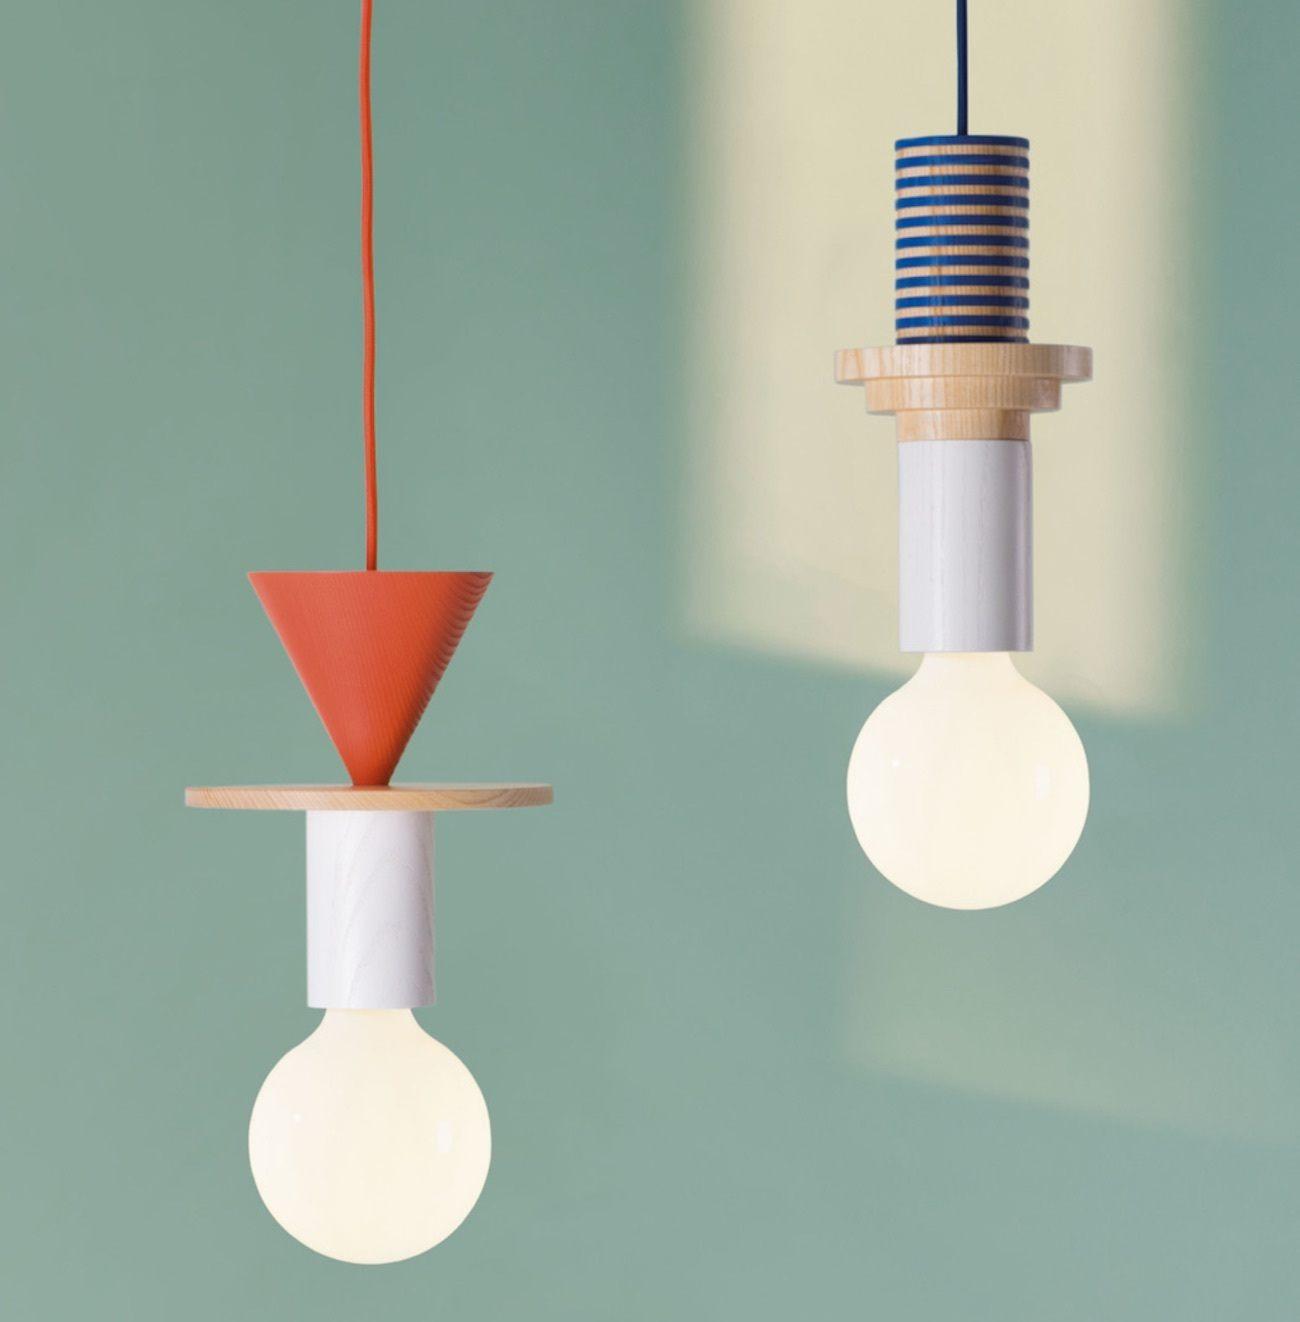 Junit+Lamp+By+Schneid